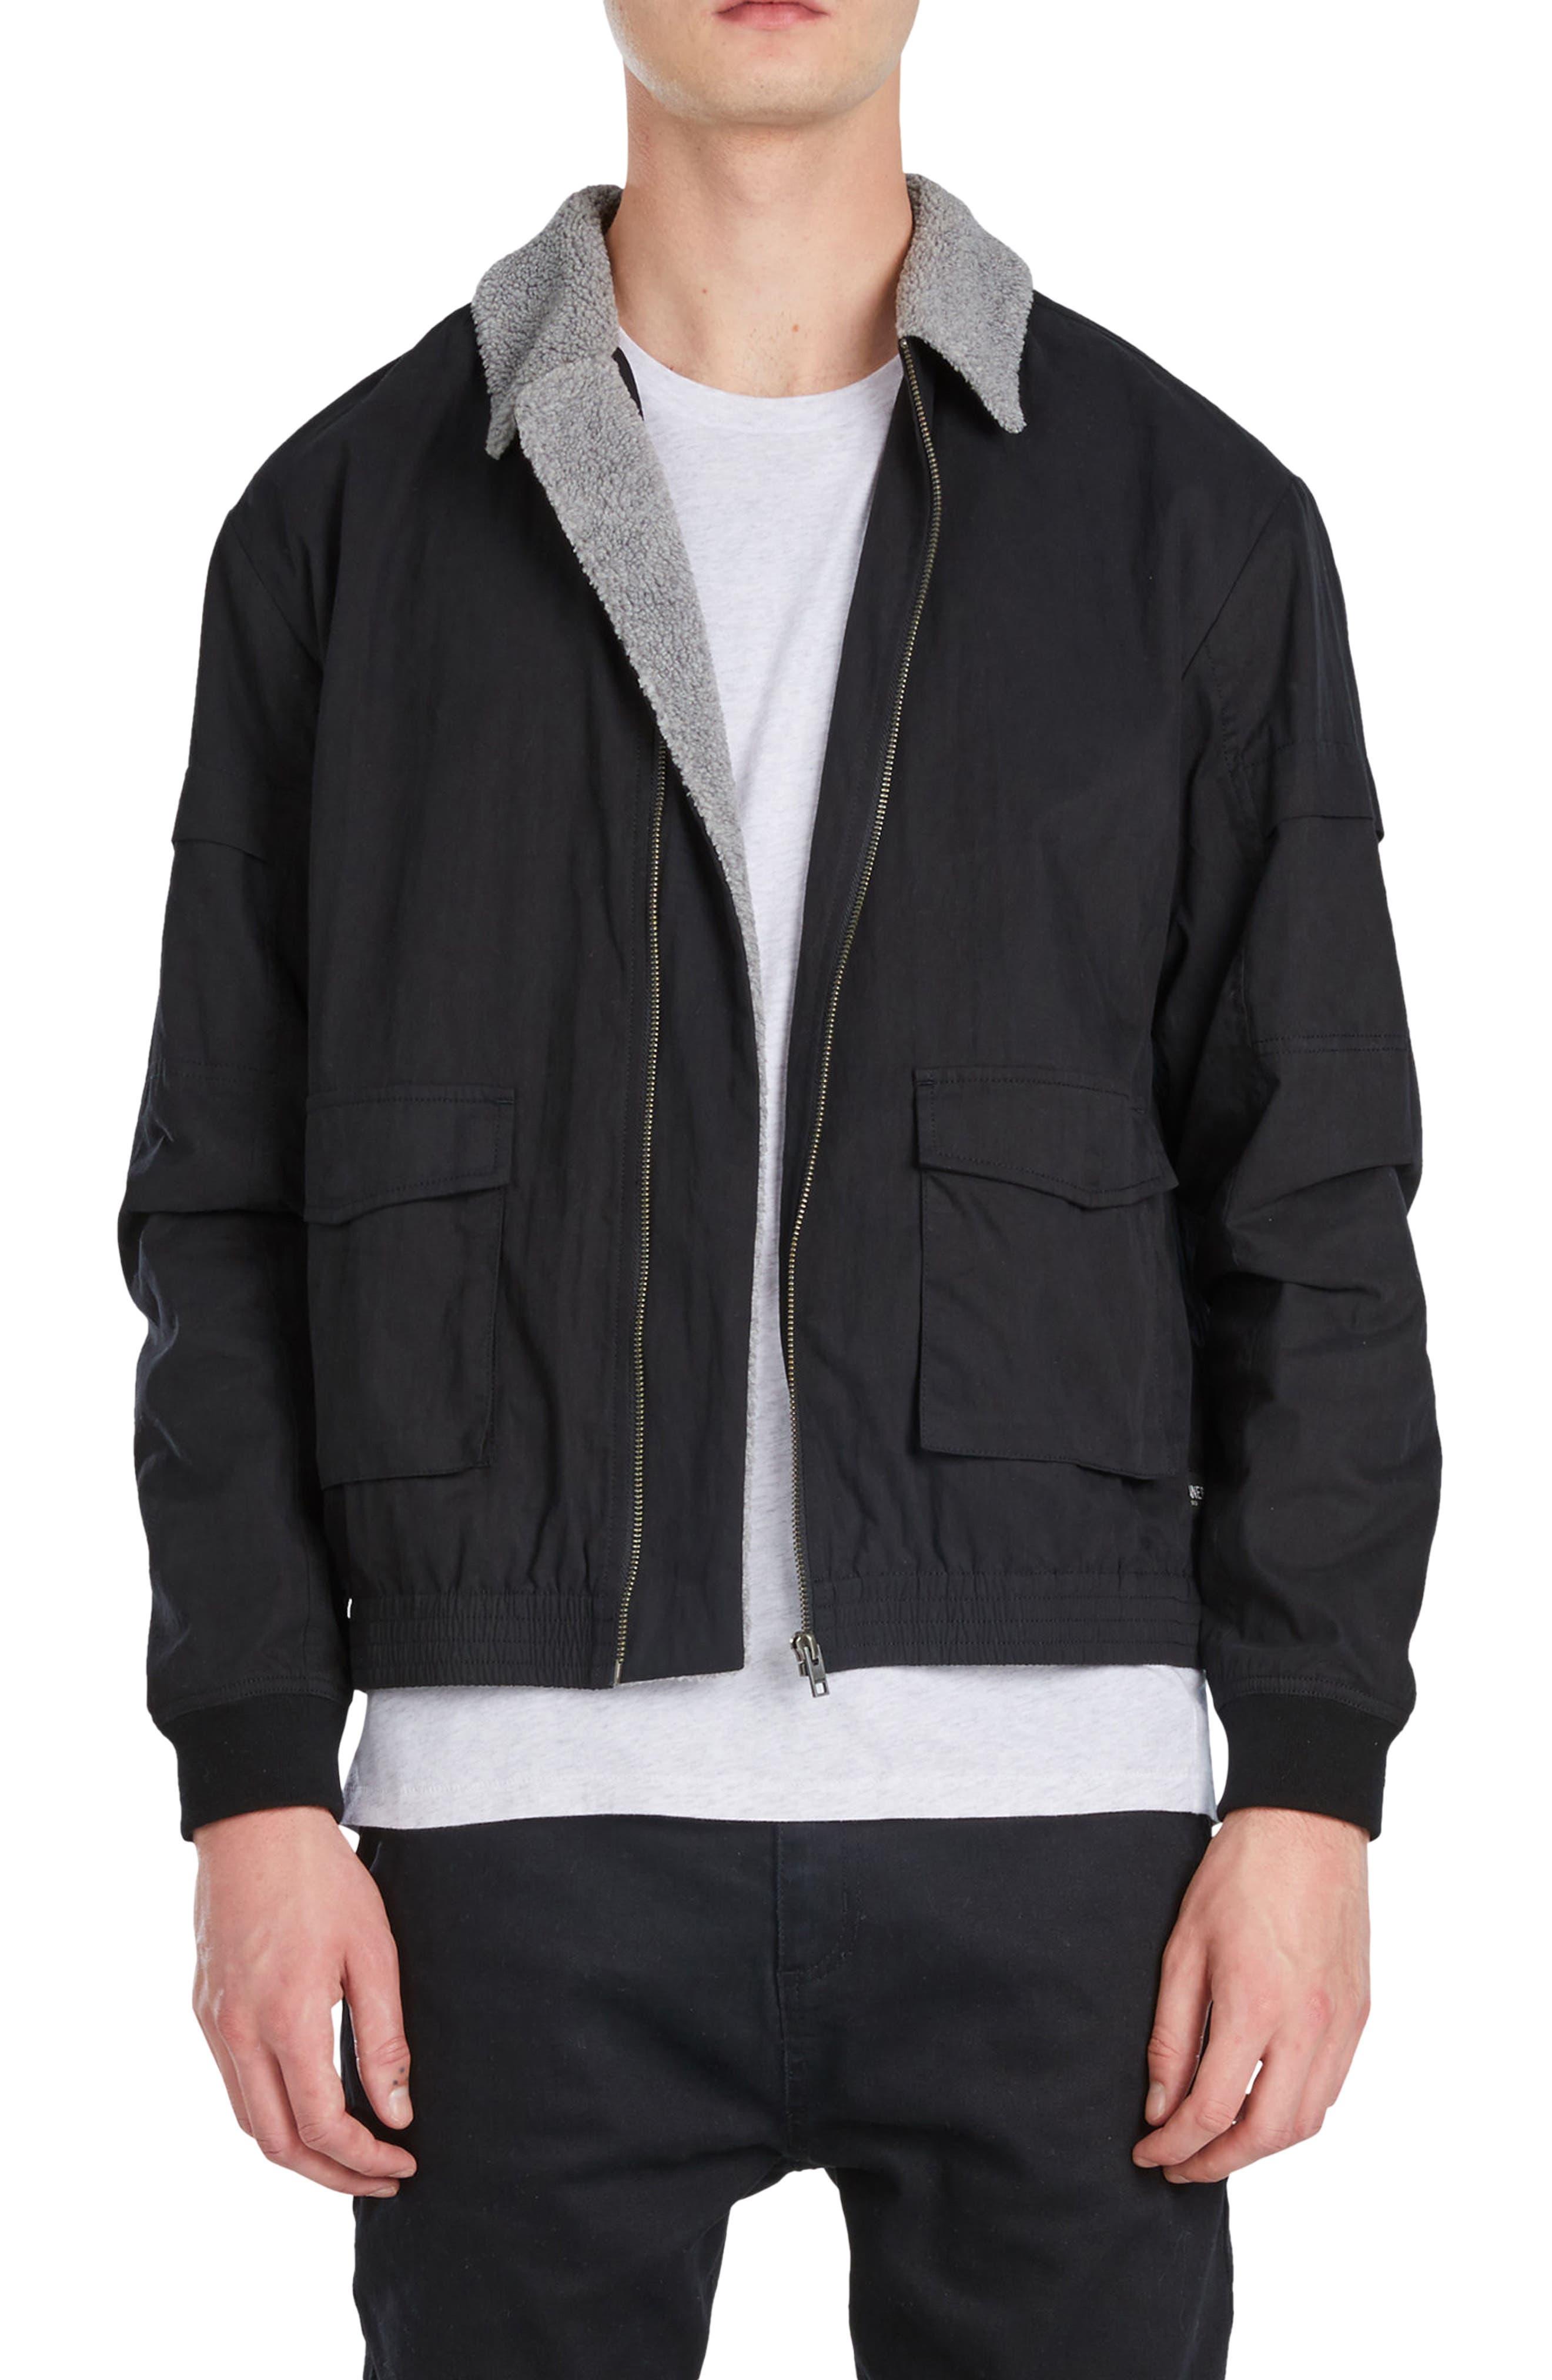 Sherpa Windbreaker Jacket,                             Main thumbnail 1, color,                             001